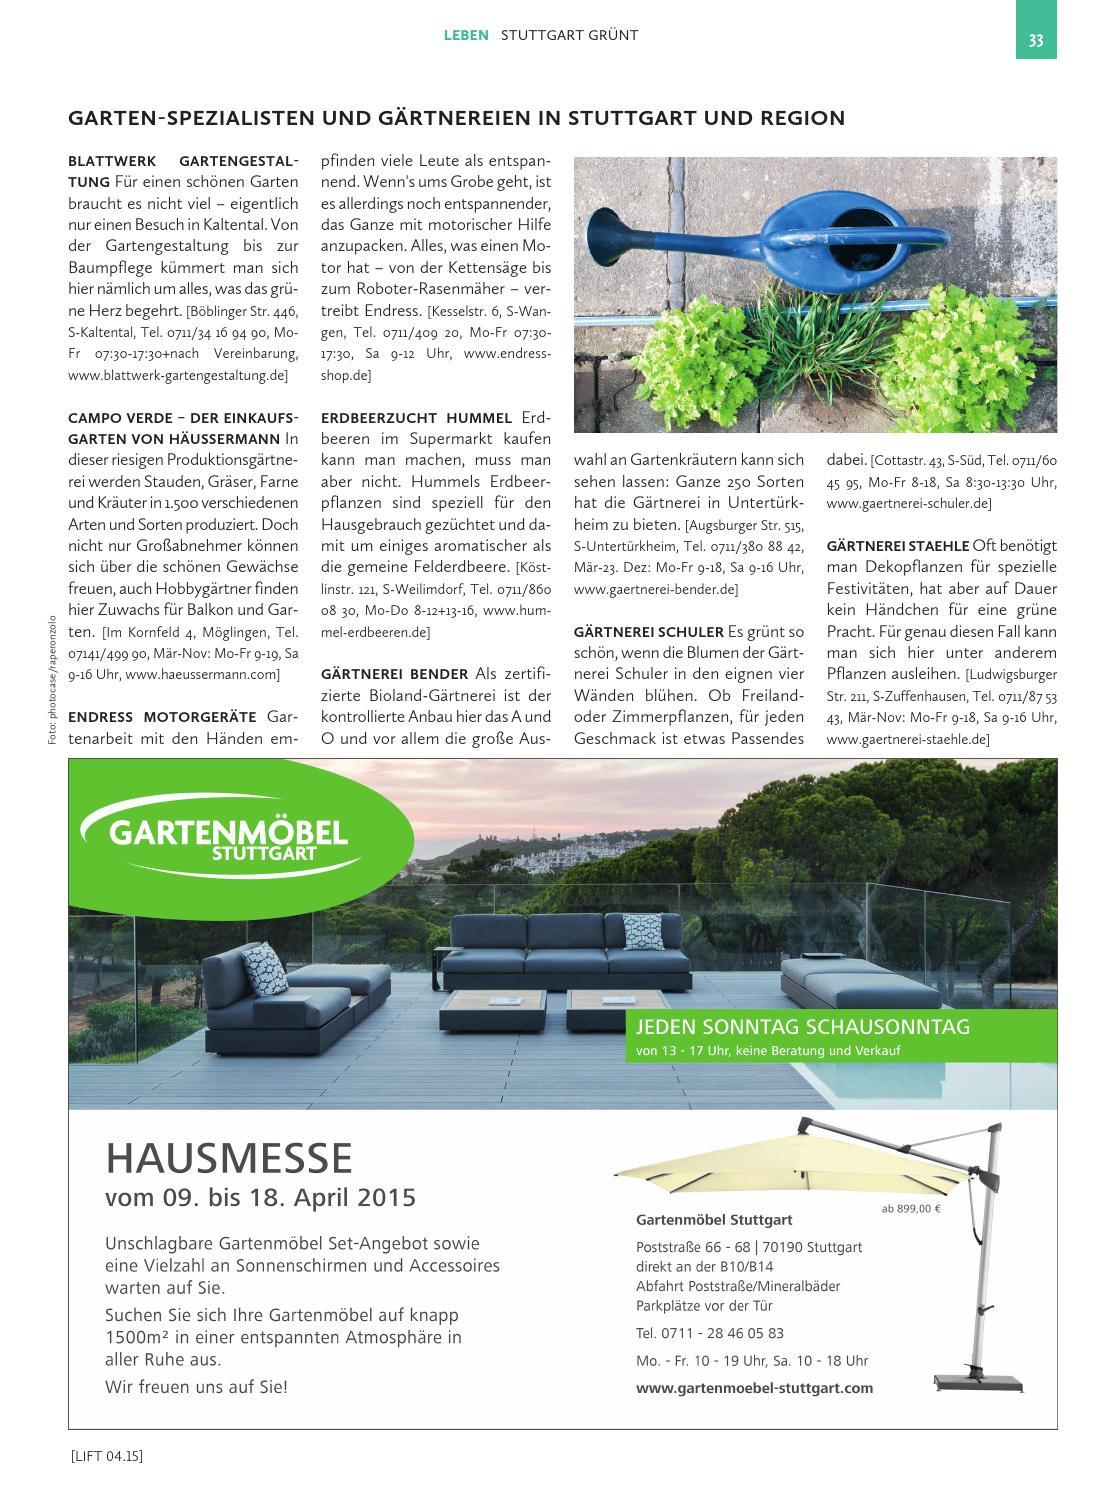 Wunderbar Stuttgarter Gartenmöbel Bilder - Hauptinnenideen - kakados.com